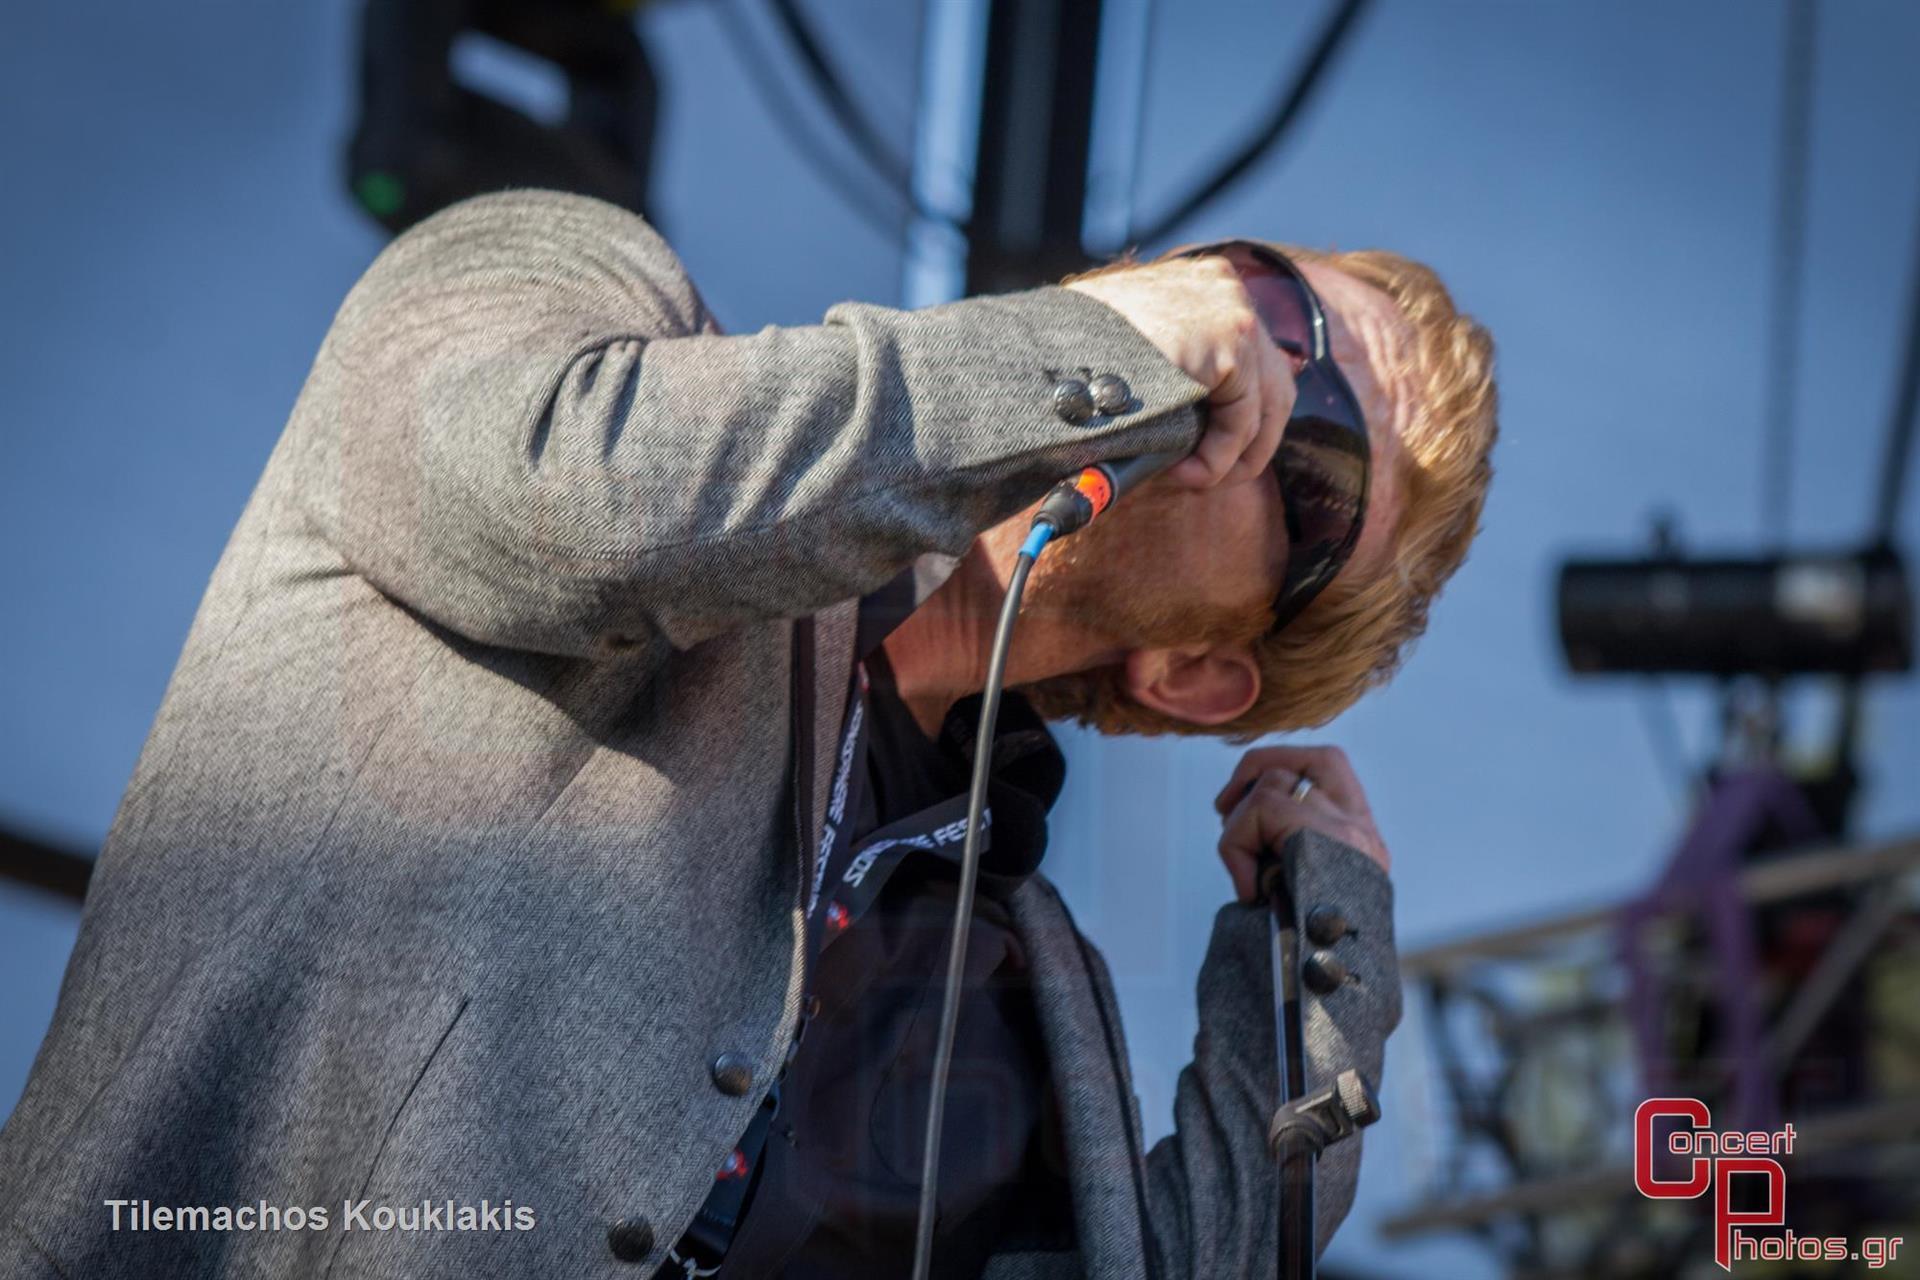 Craig Walker-Craig Walker photographer: Tilemachos Kouklakis - concertphotos_-0390